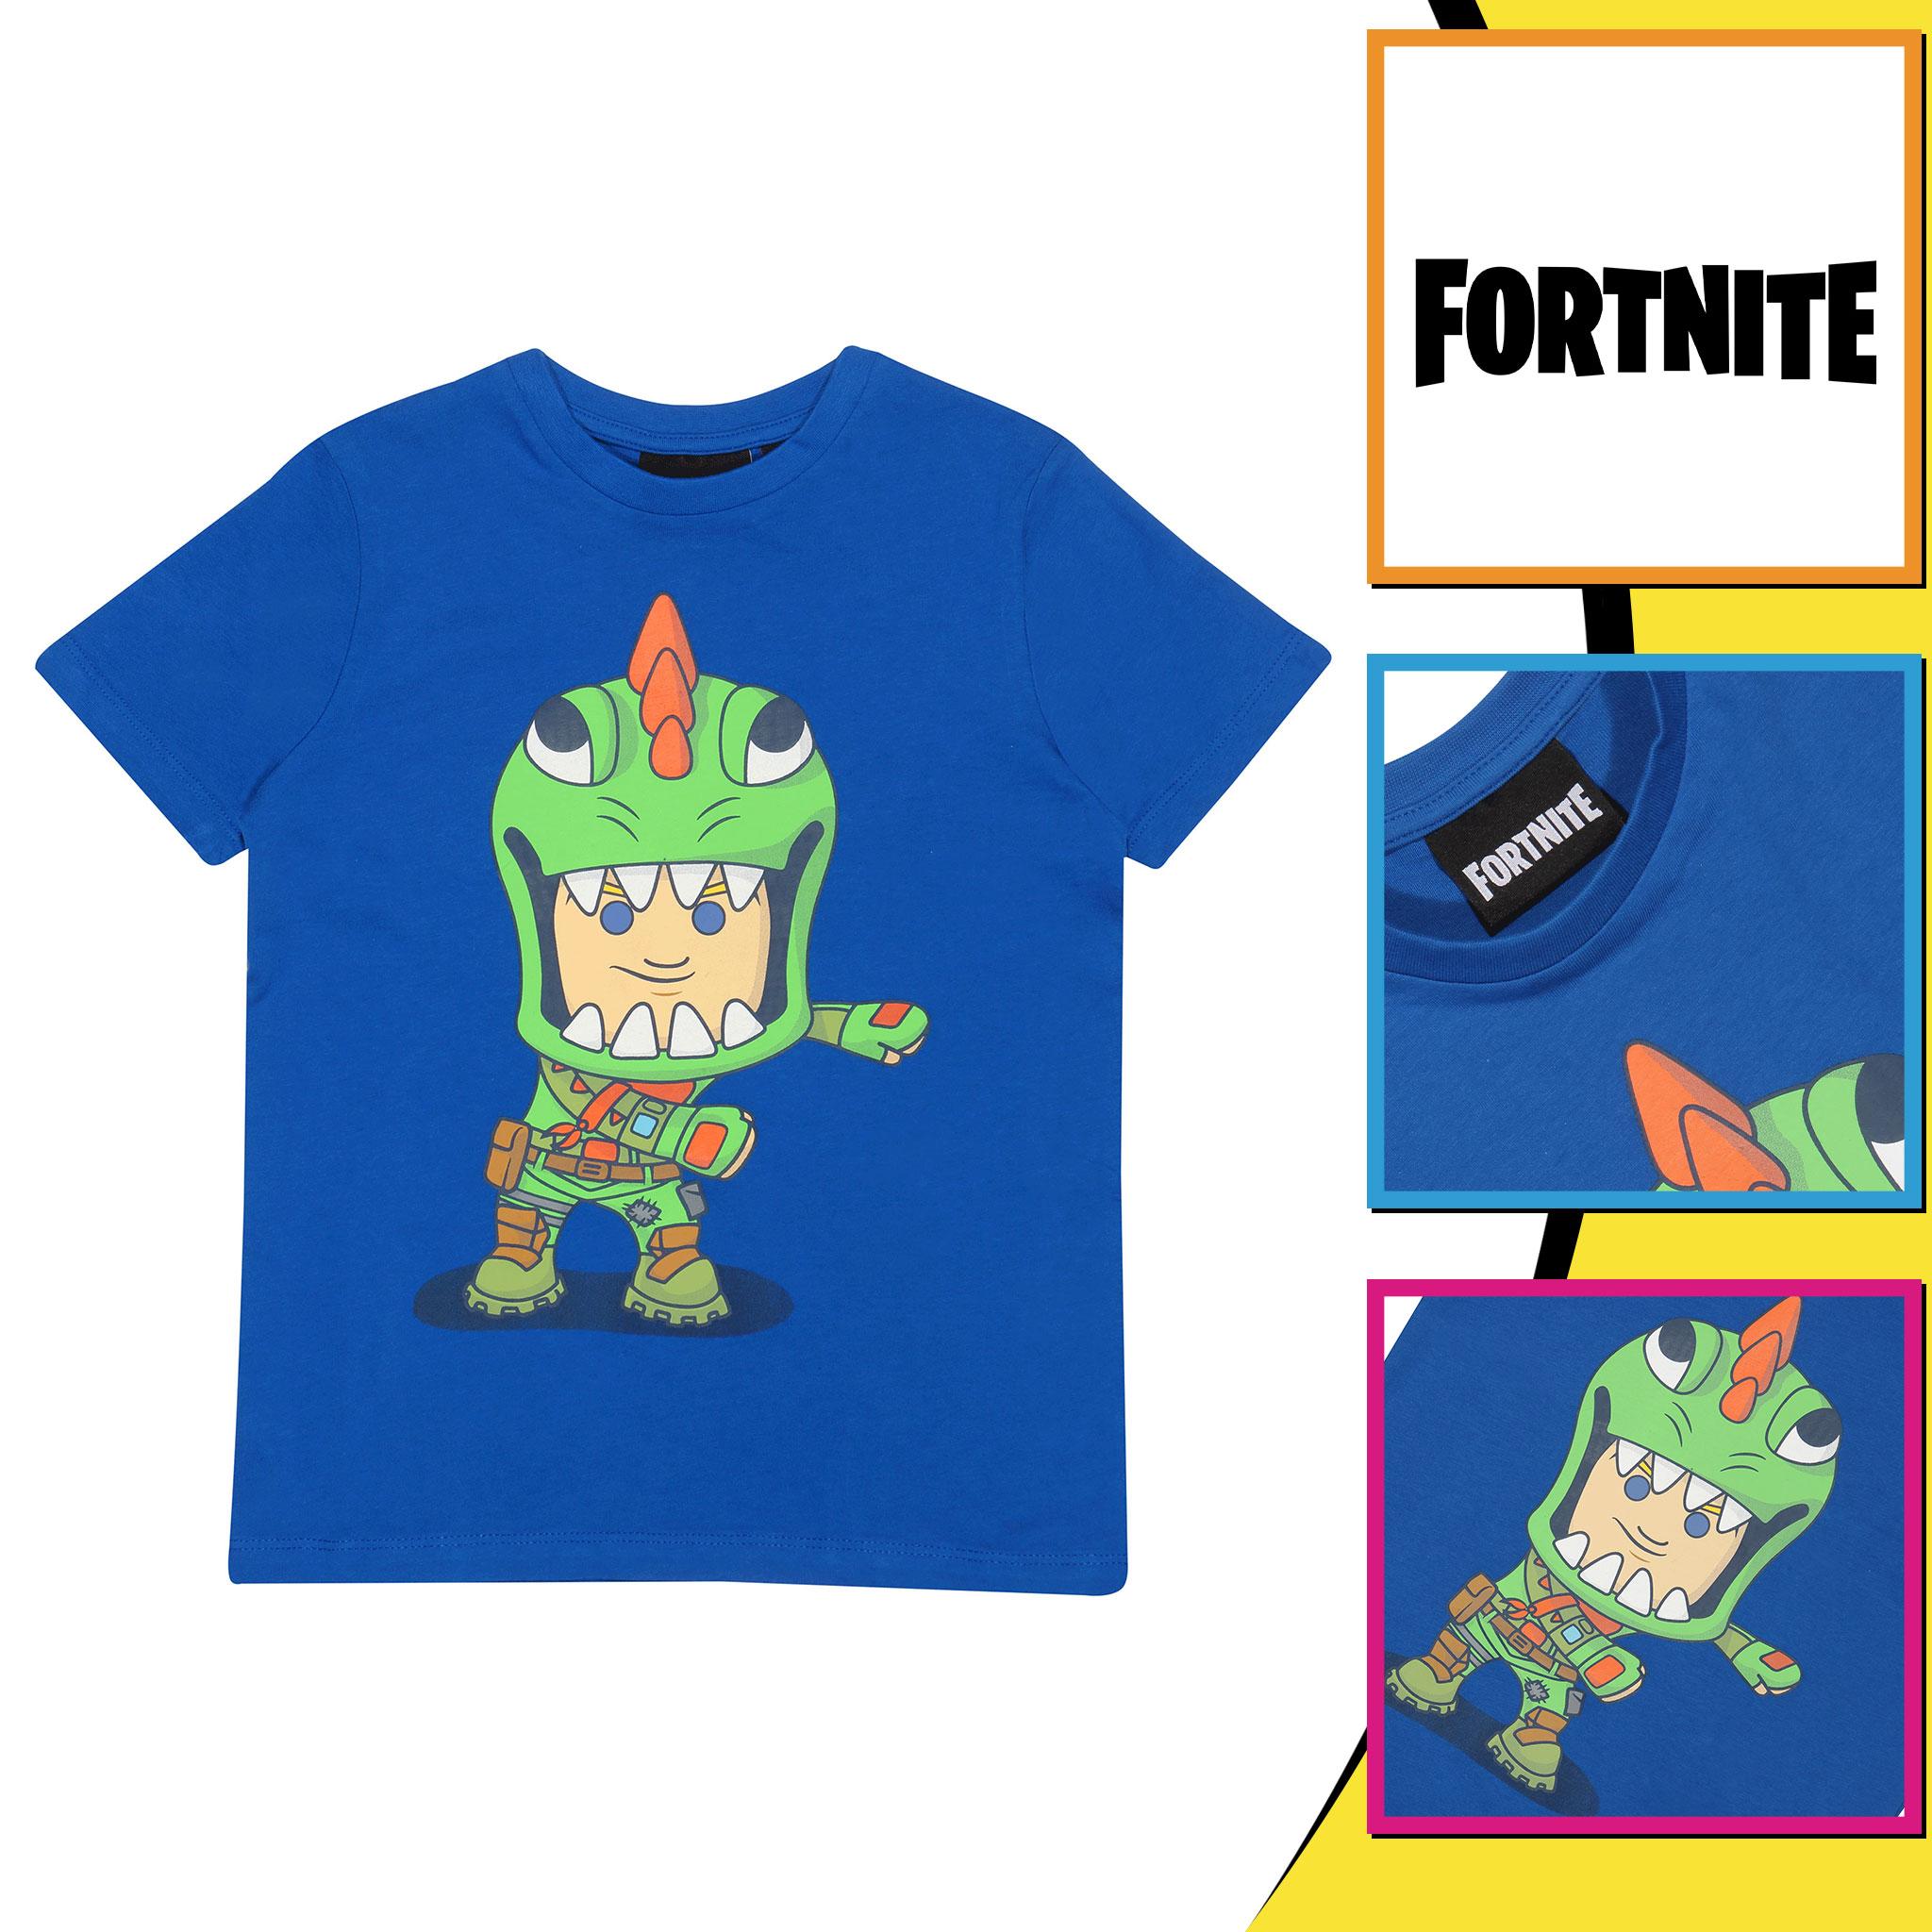 miniature 9 - Boys Fortnite T Shirt Flossing Rex Official Blue